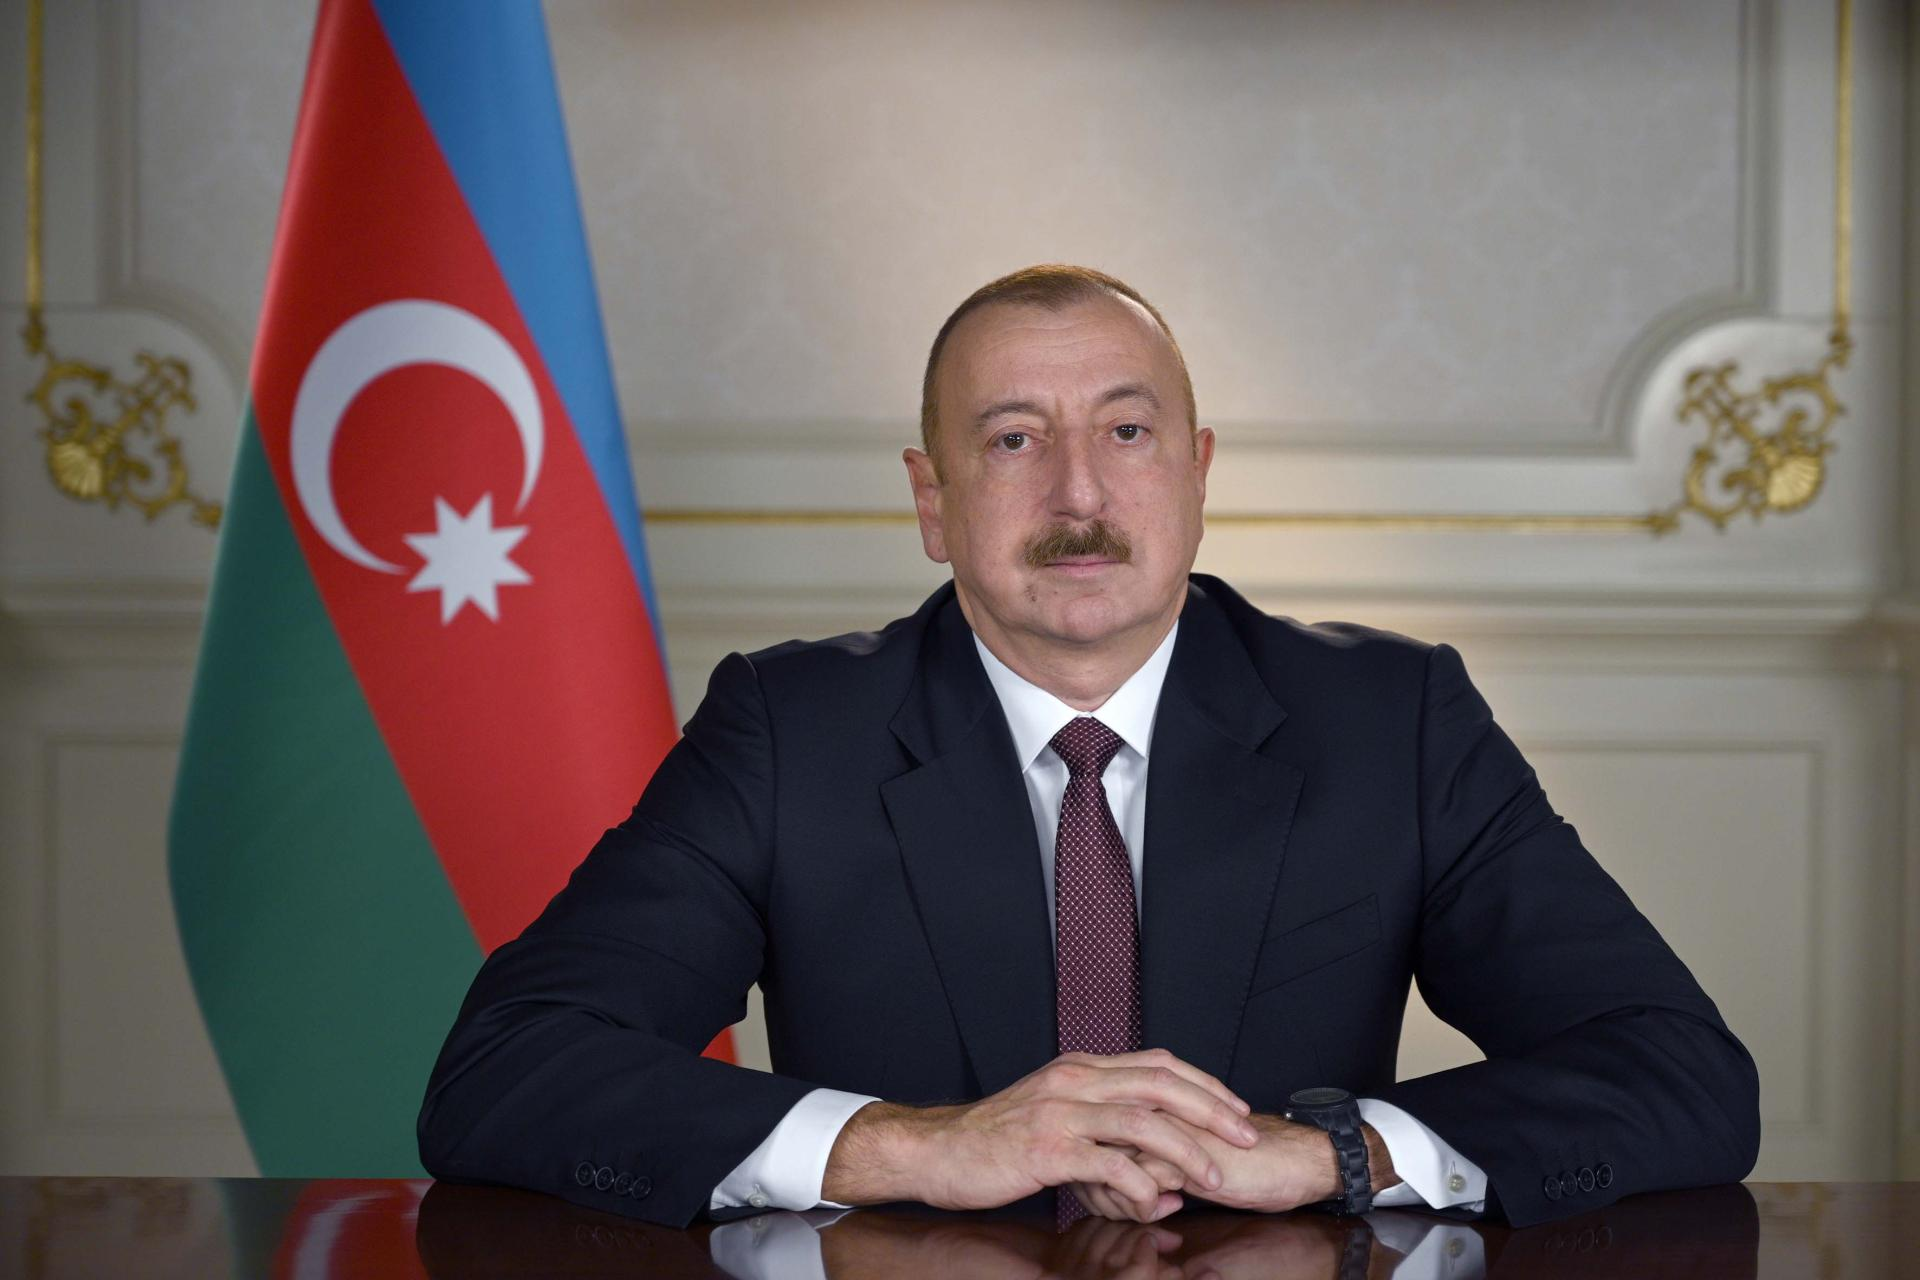 2020/05/ilham_aliyev_main_new_president_310120_1_1590666185.jpg